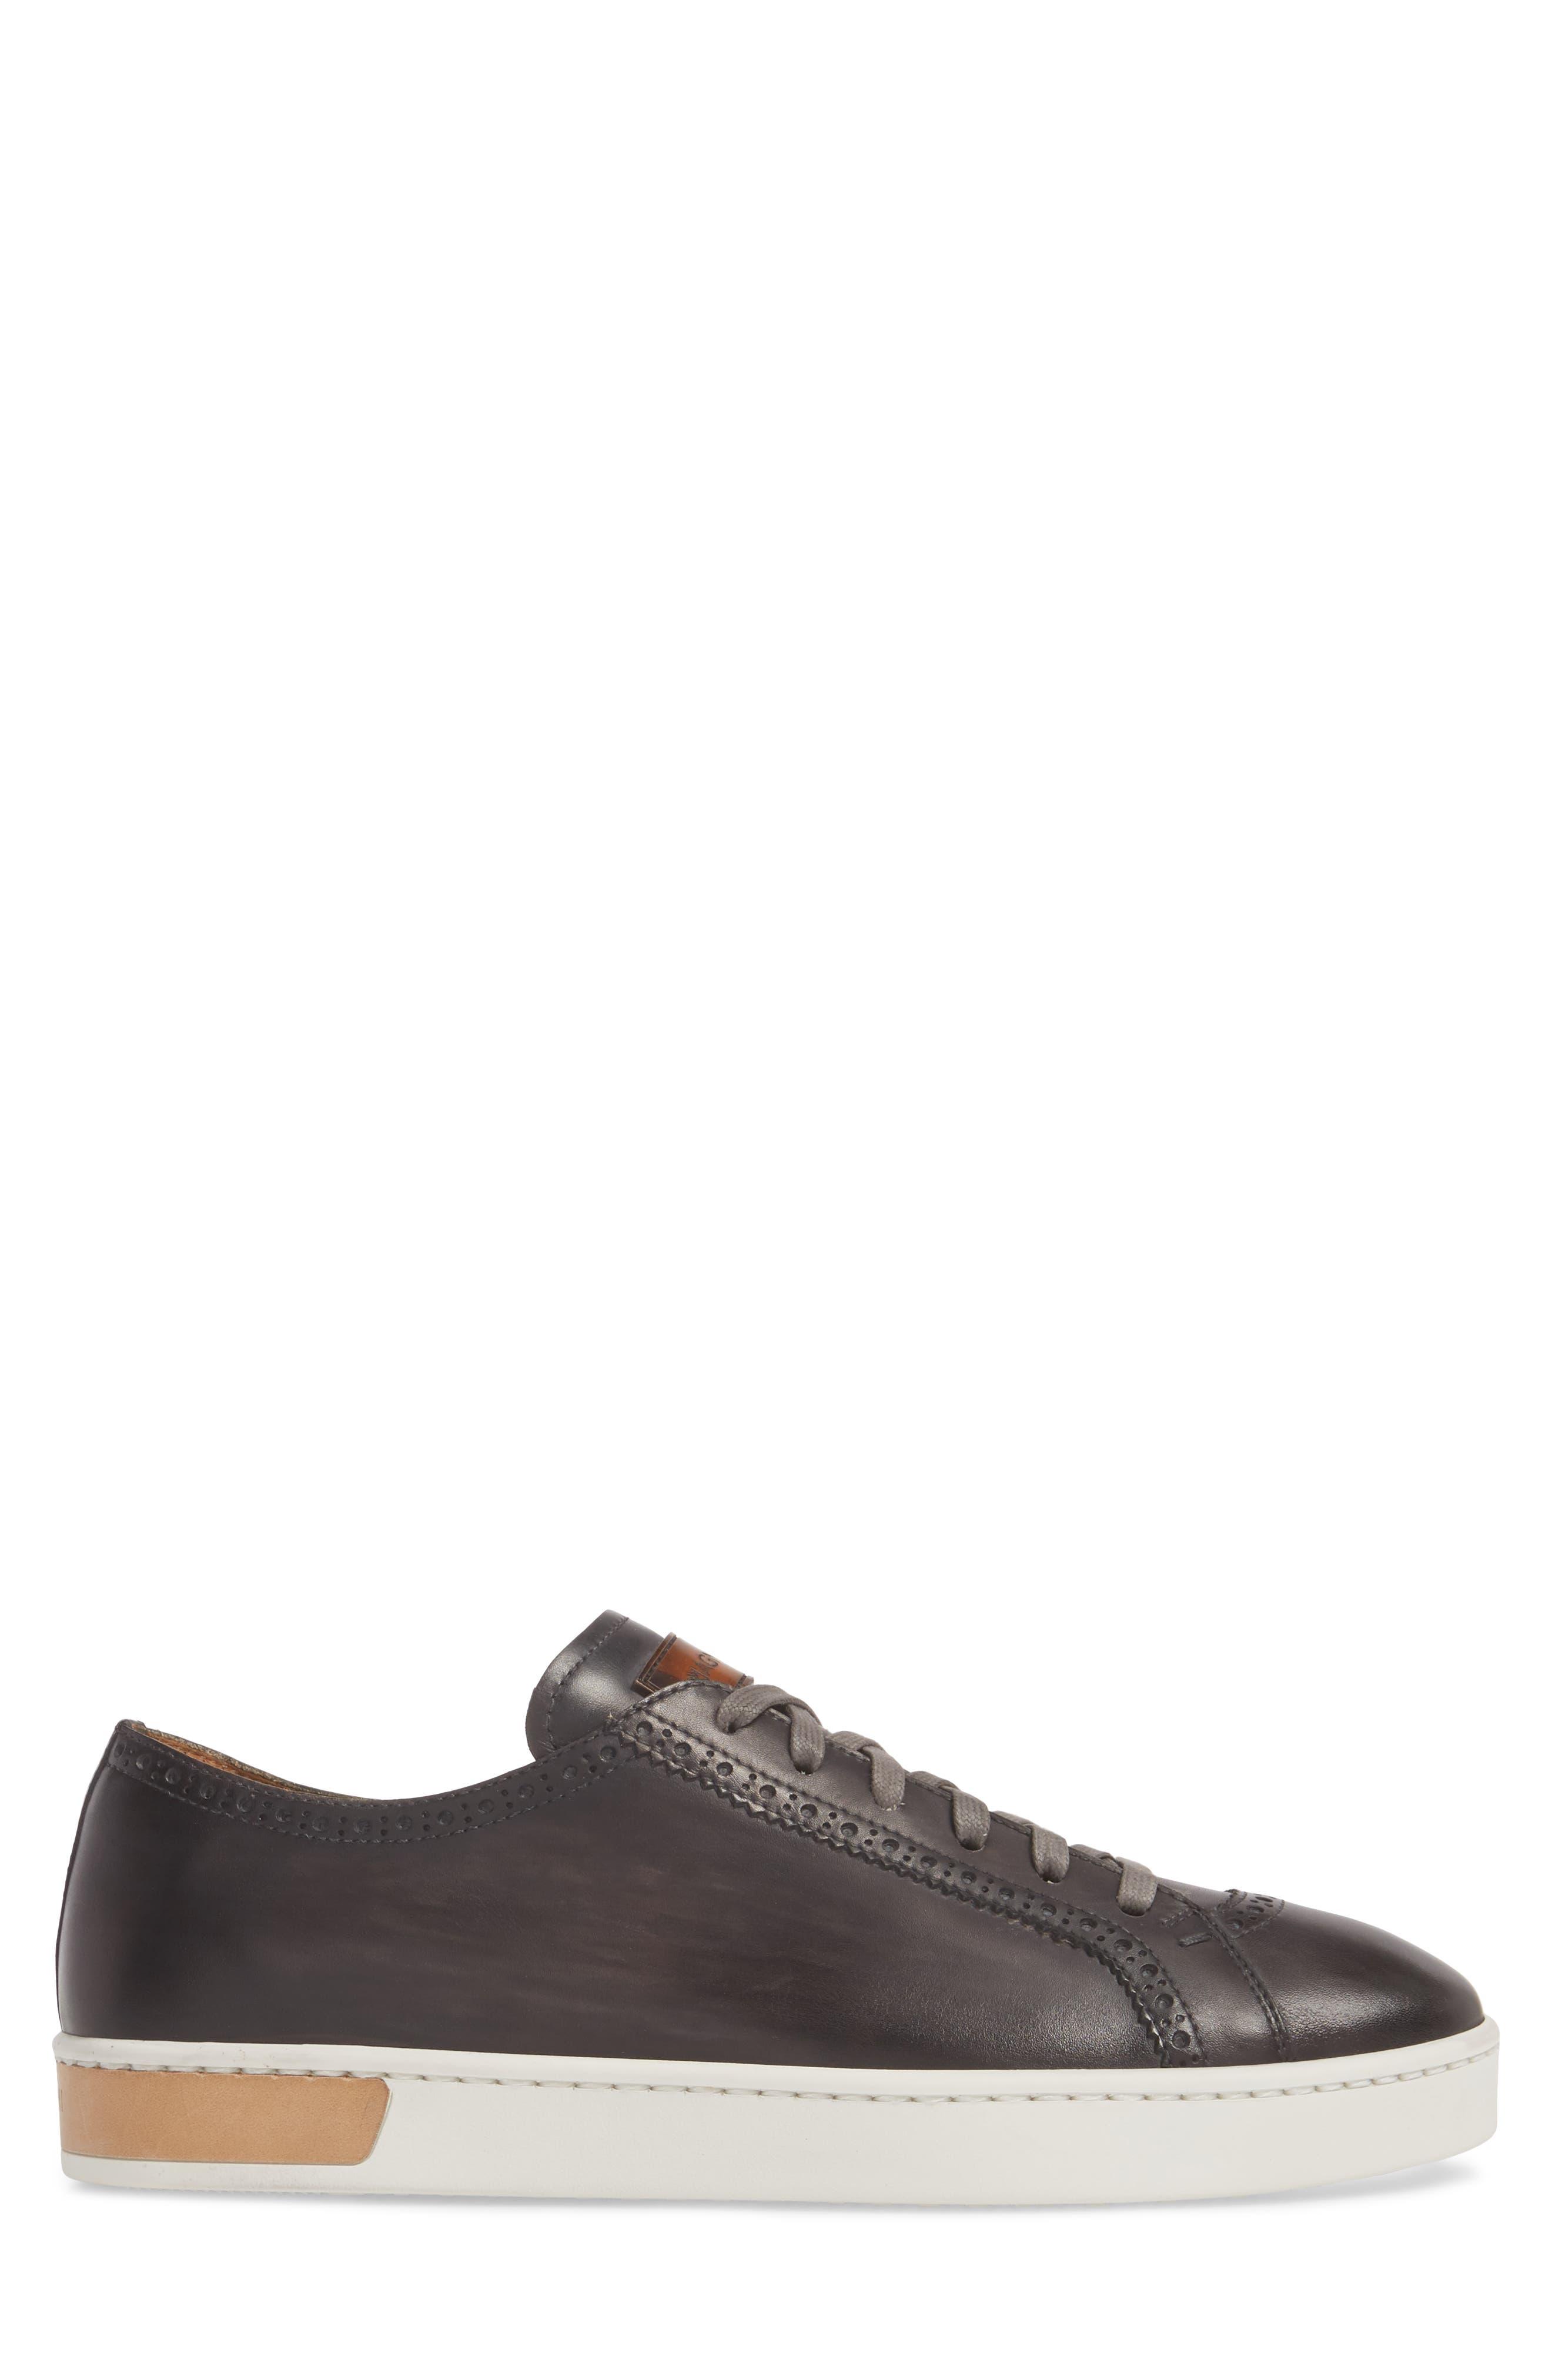 Juniper Brogued Low Top Sneaker,                             Alternate thumbnail 3, color,                             Grey Leather